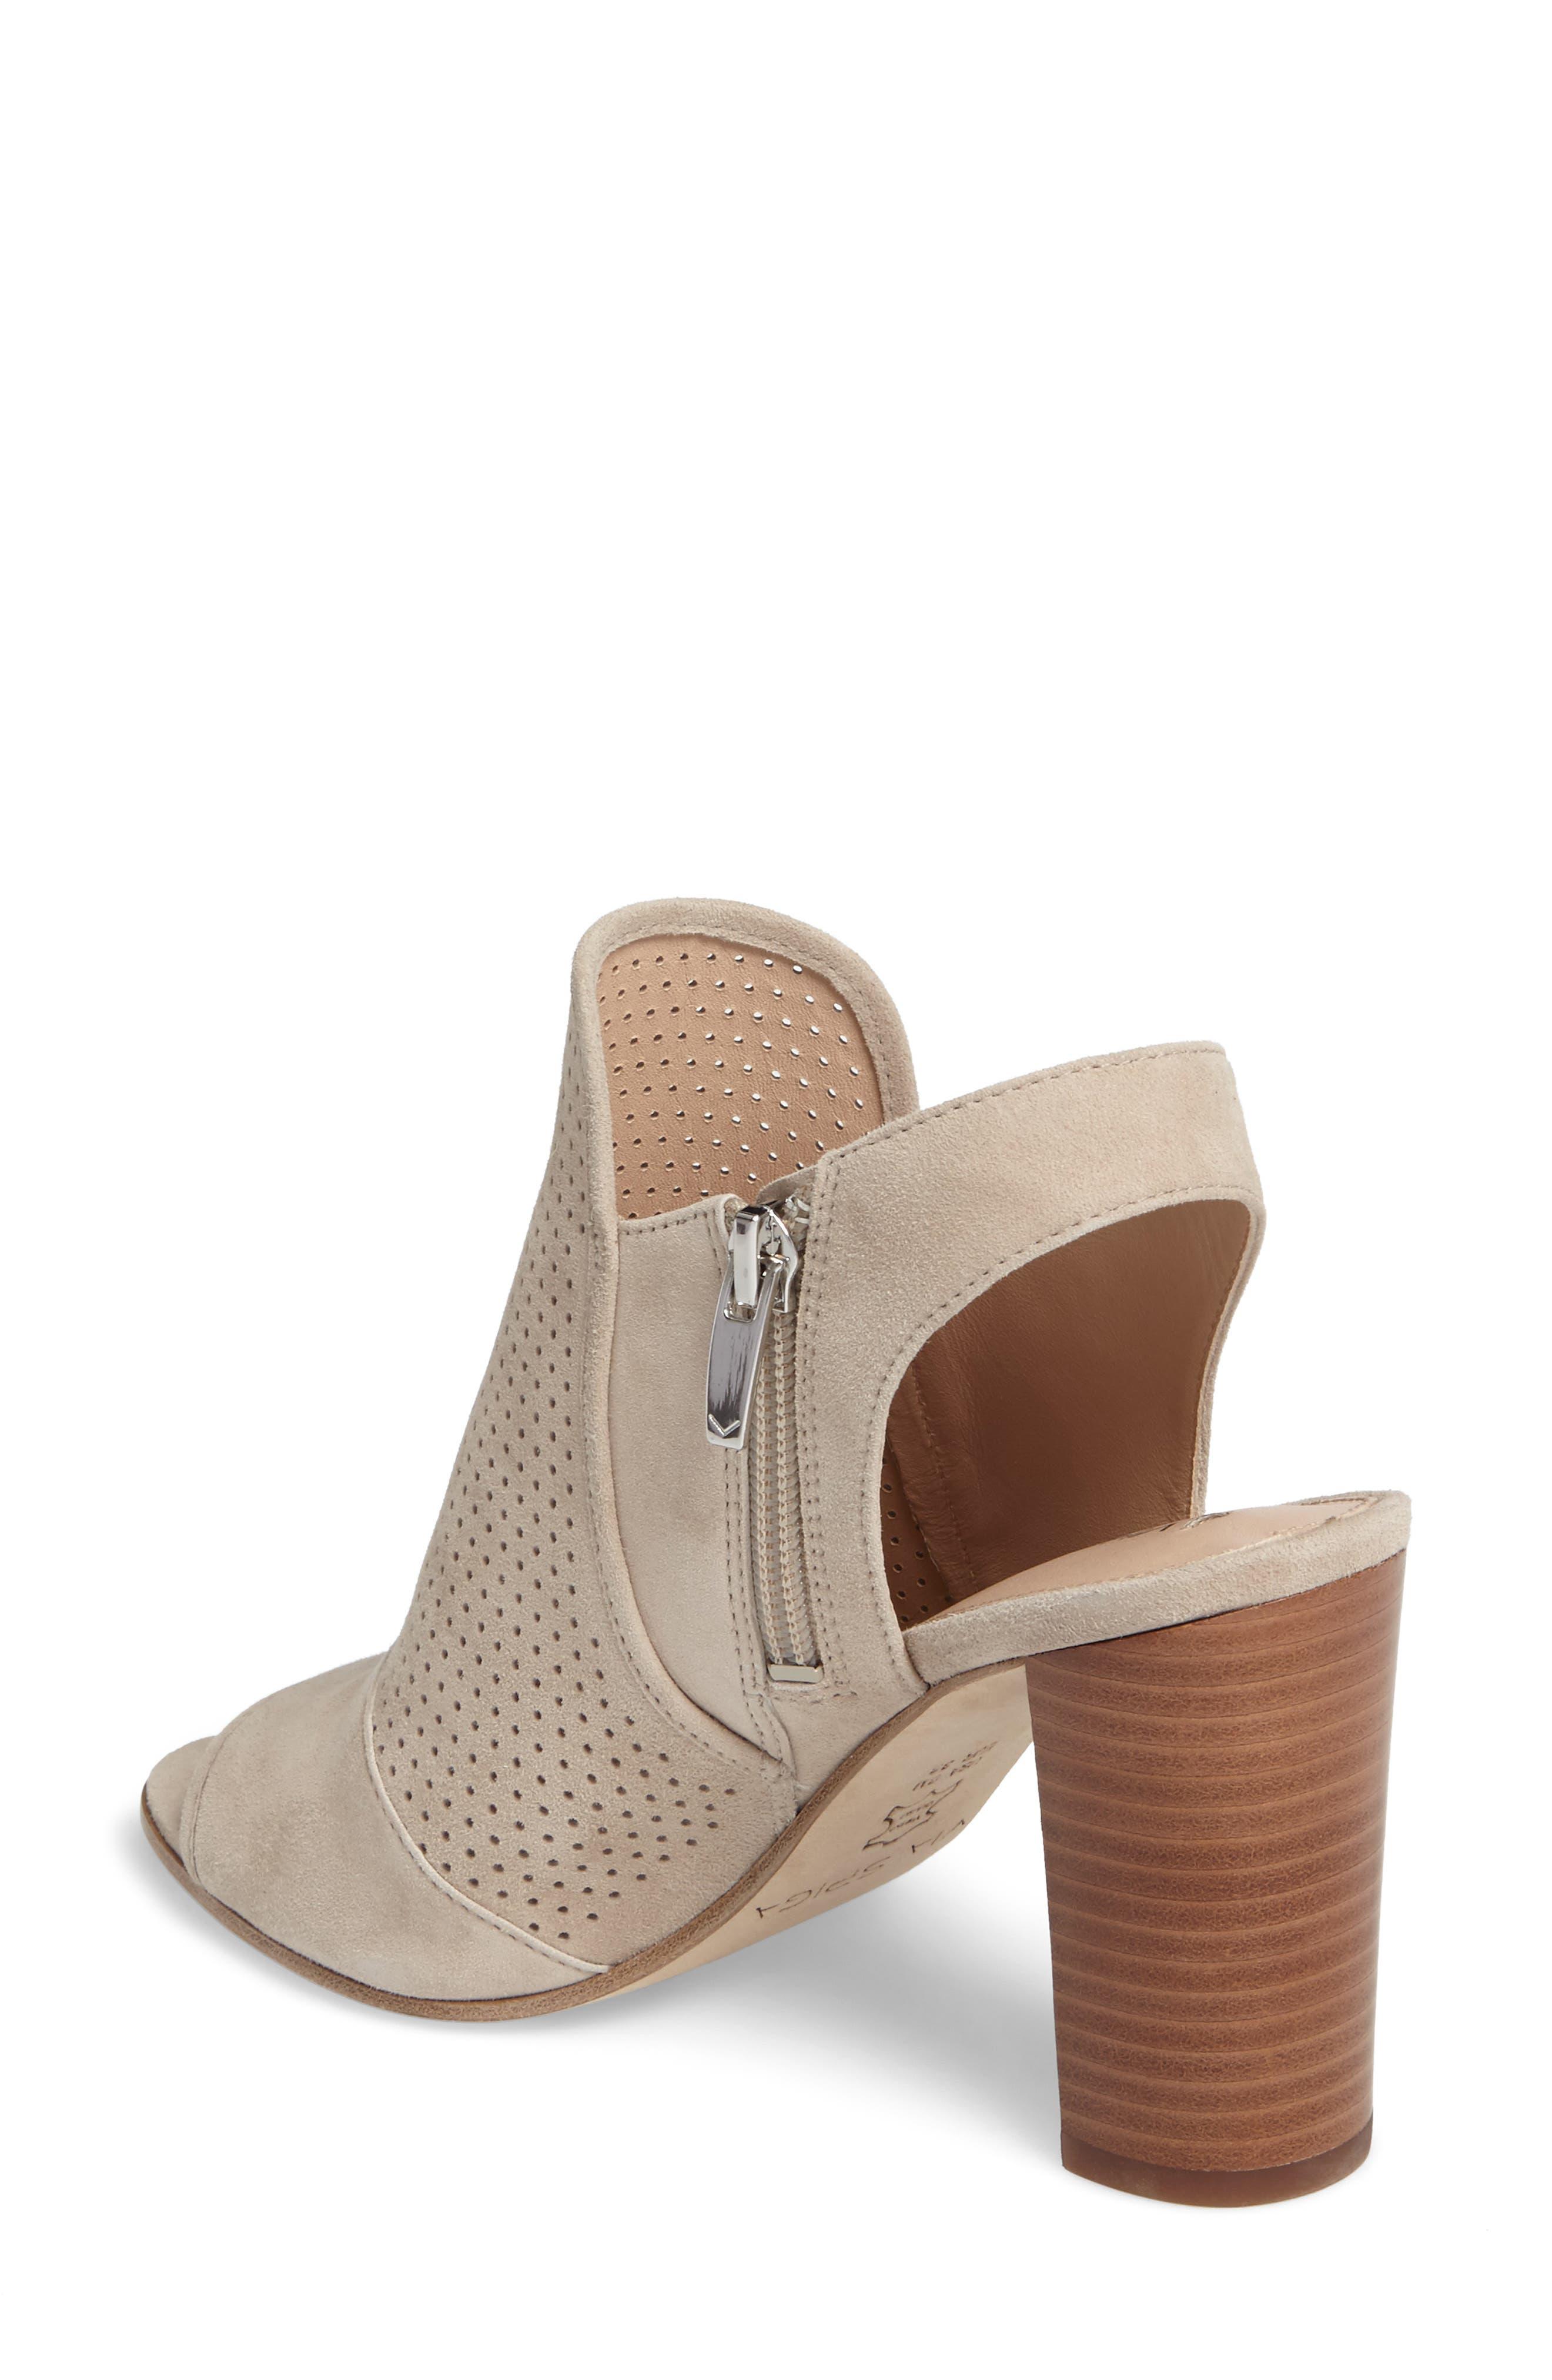 Alternate Image 2  - Via Spiga Gaze Block Heel Sandal (Women)